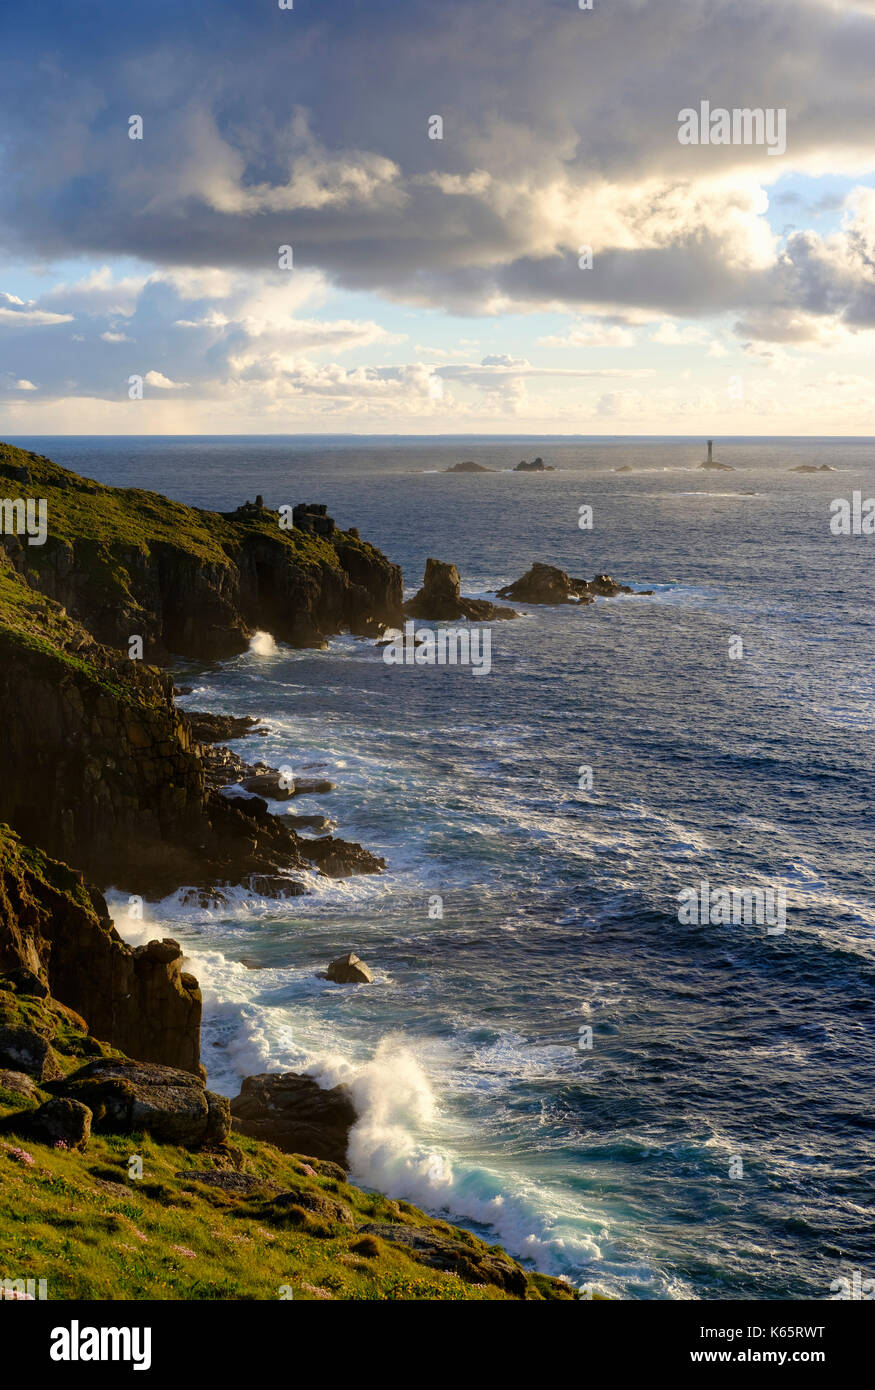 Longship Lighthouse, Longships Lighthouse, Land's End, Cornwall, England, Great Britain - Stock Image